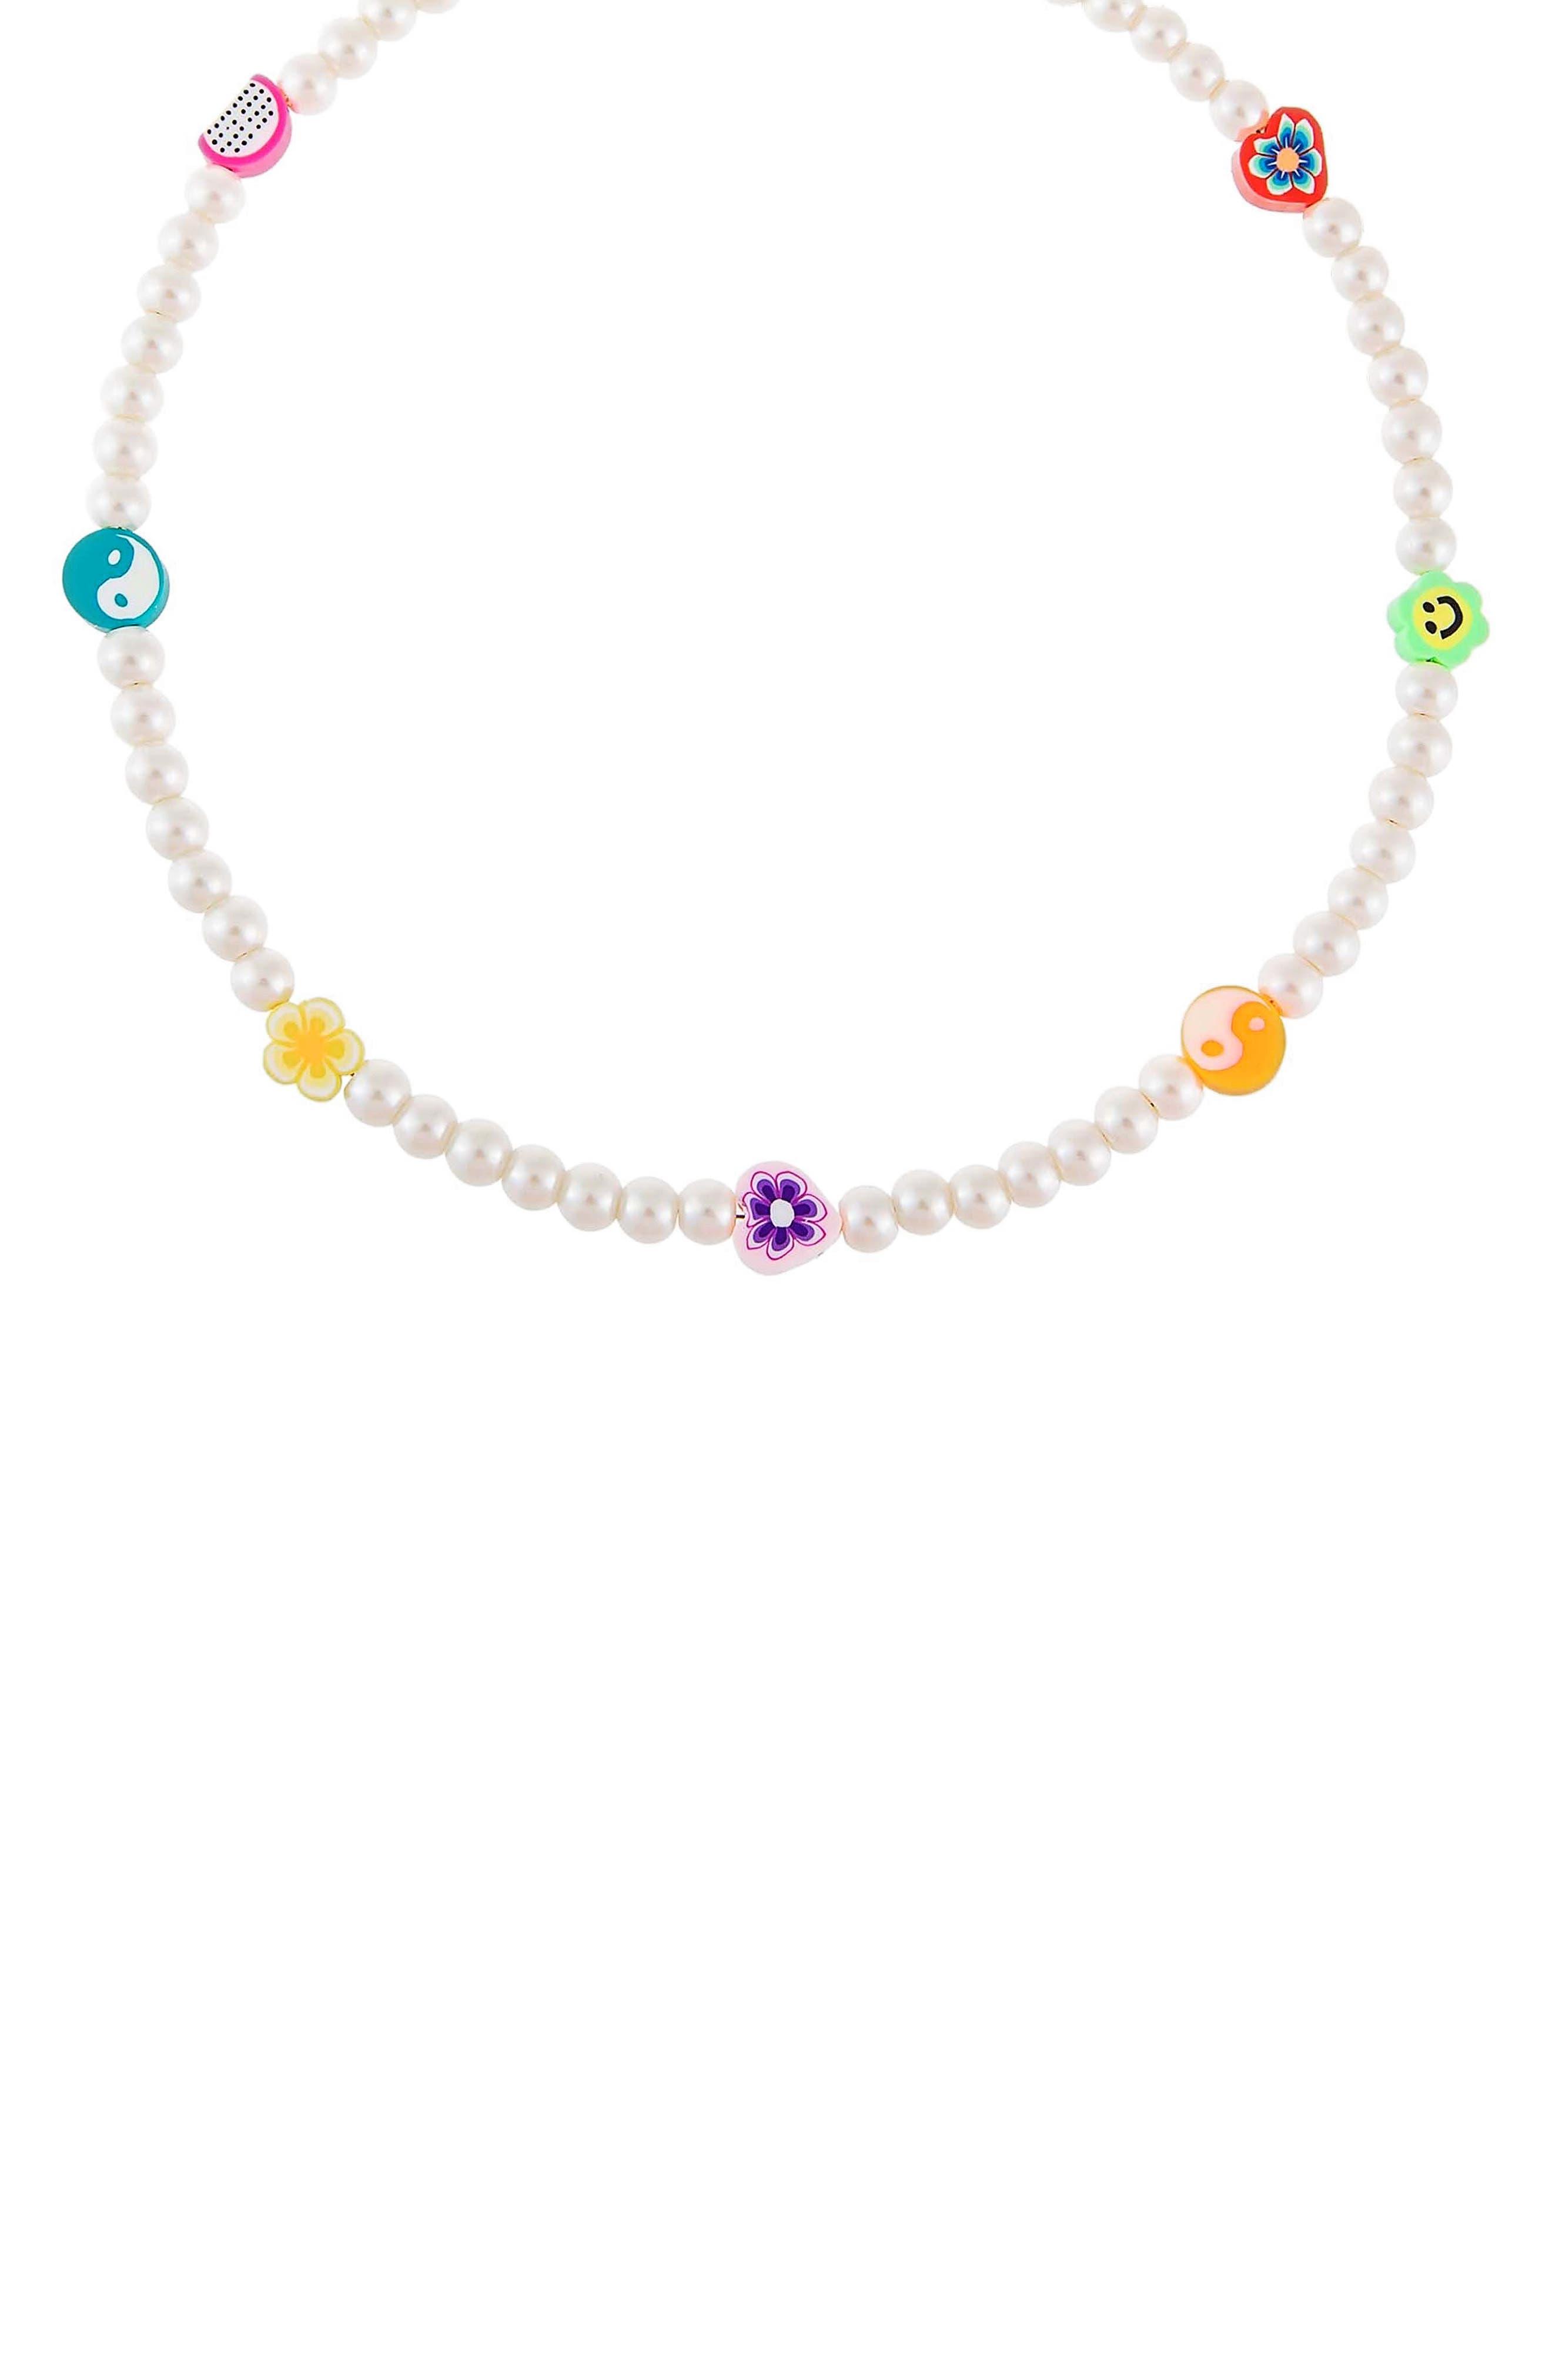 Women's Adina's Jewels Multicharm Imitation Pearl Necklace